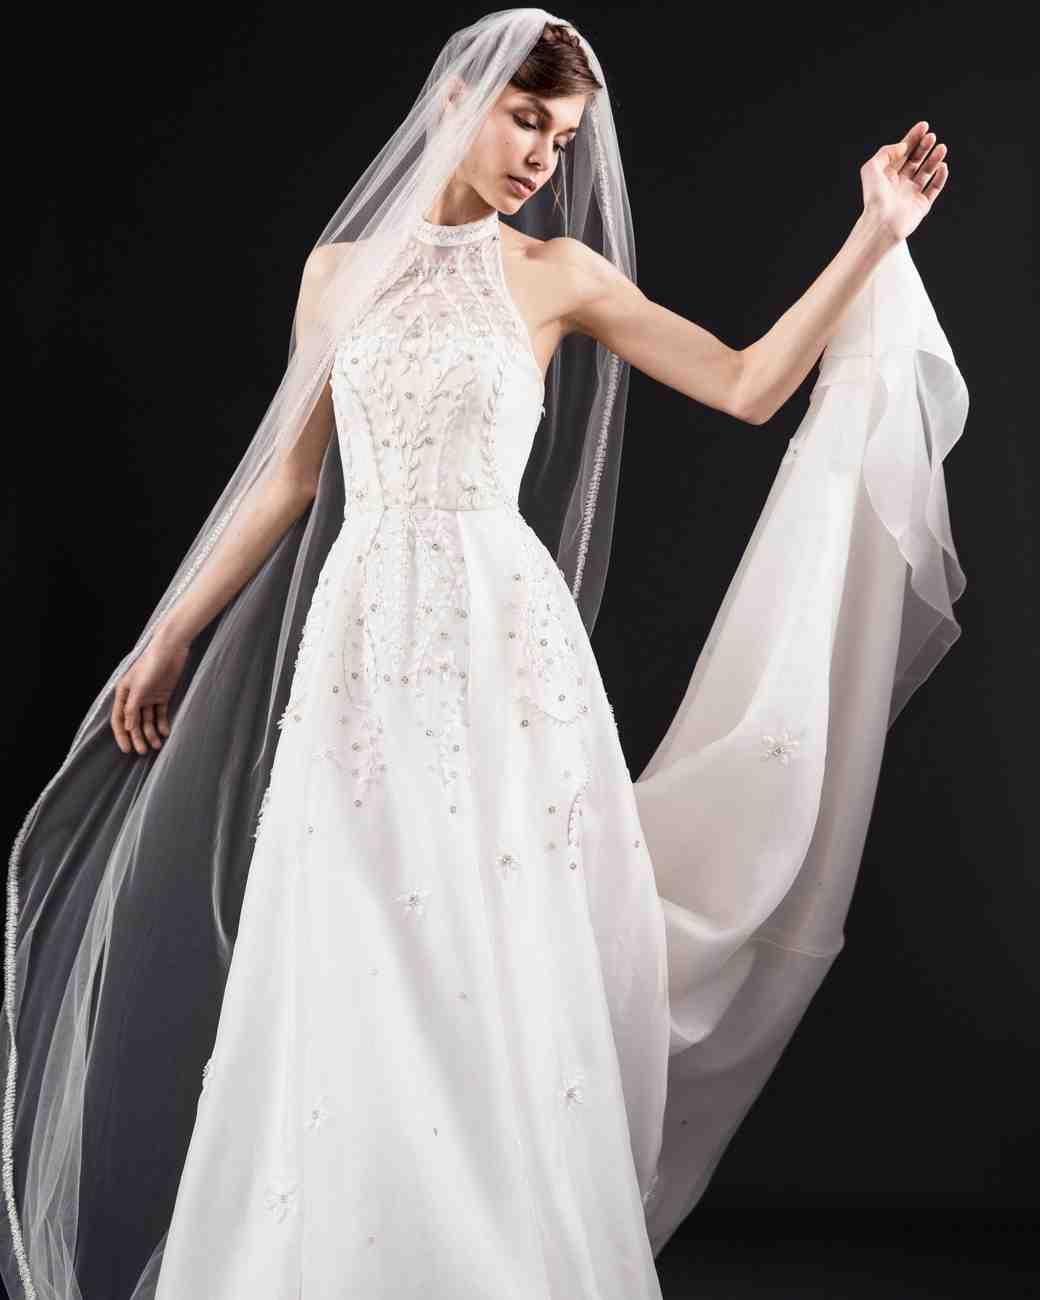 temperley-london-indira-dress-bridal-market-ss17-0416.jpg